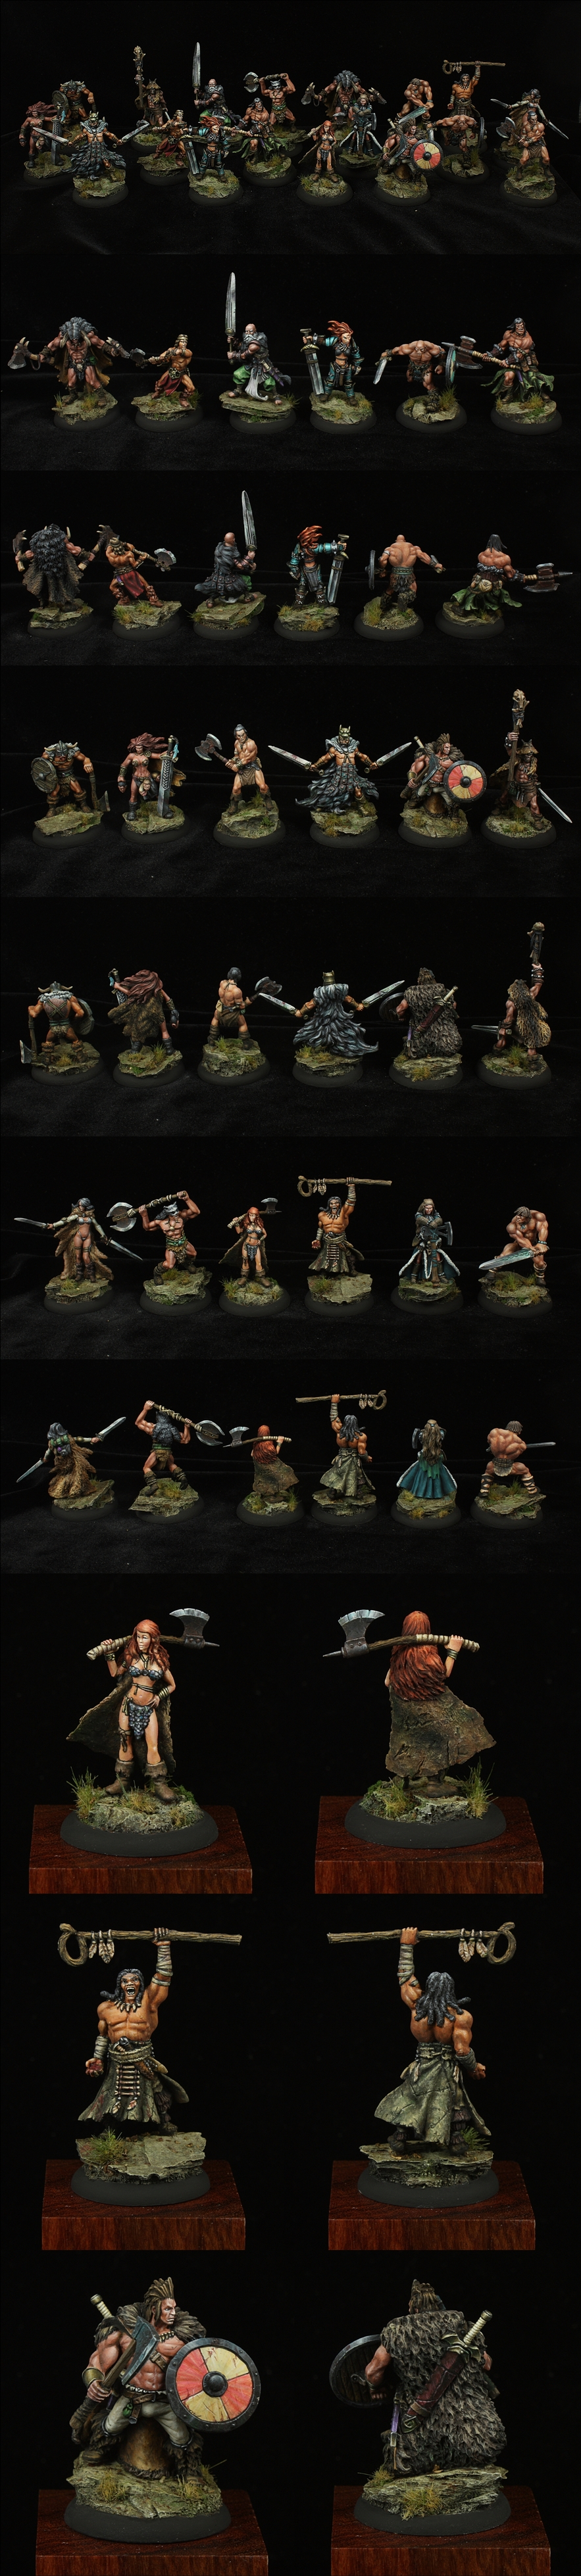 Barbarian Army